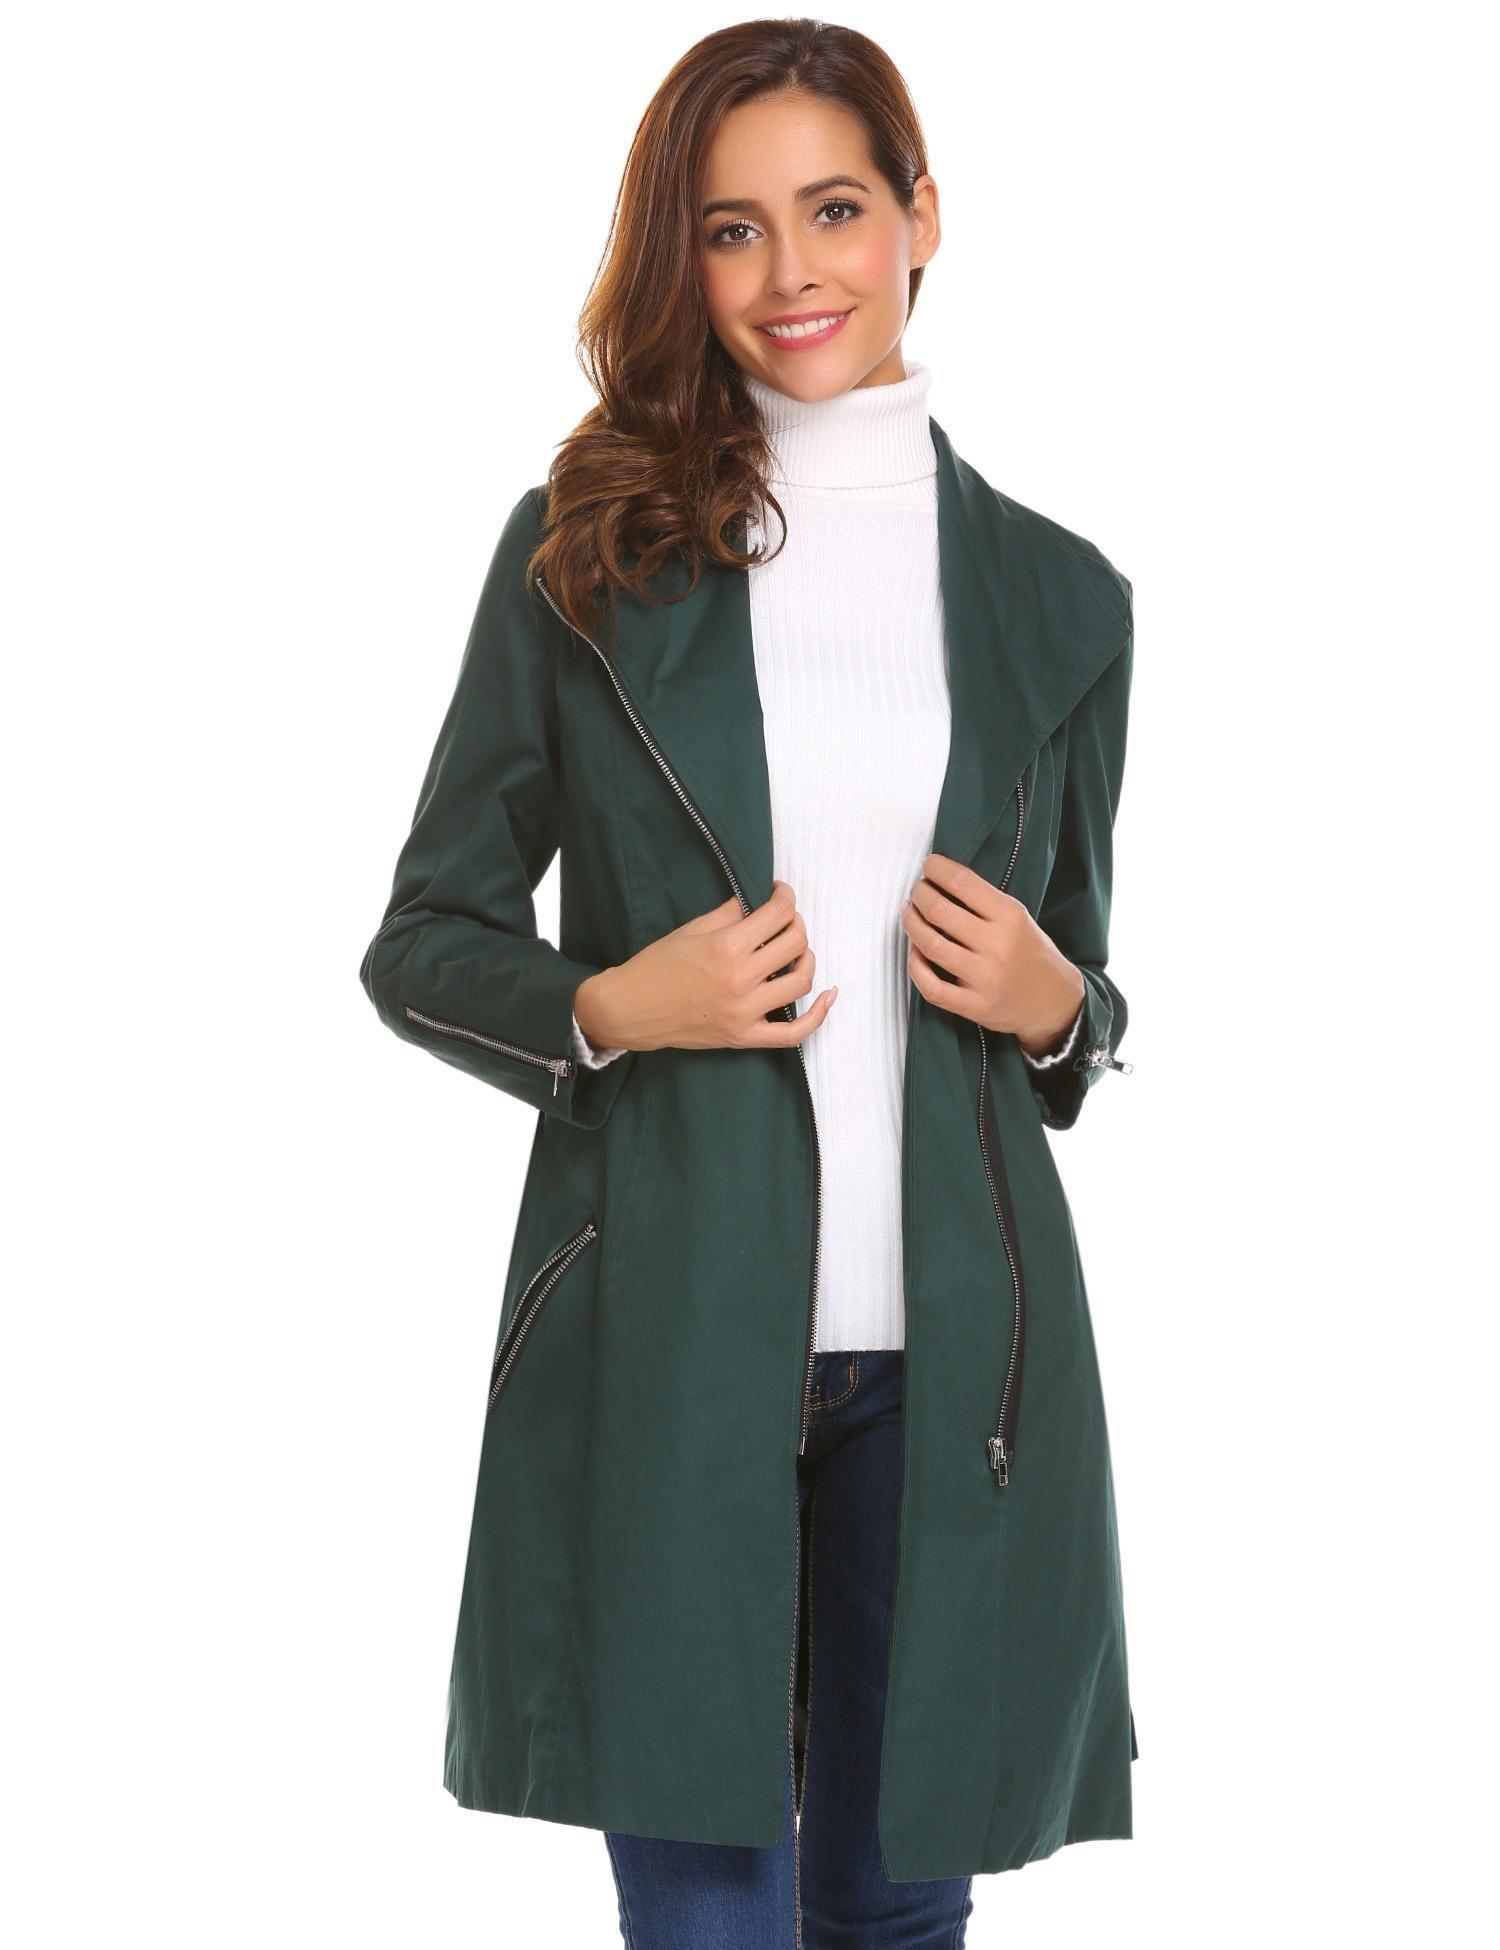 Zeagoo Elegant Lapel Zipper Pockets Long Trench Coat with Belt